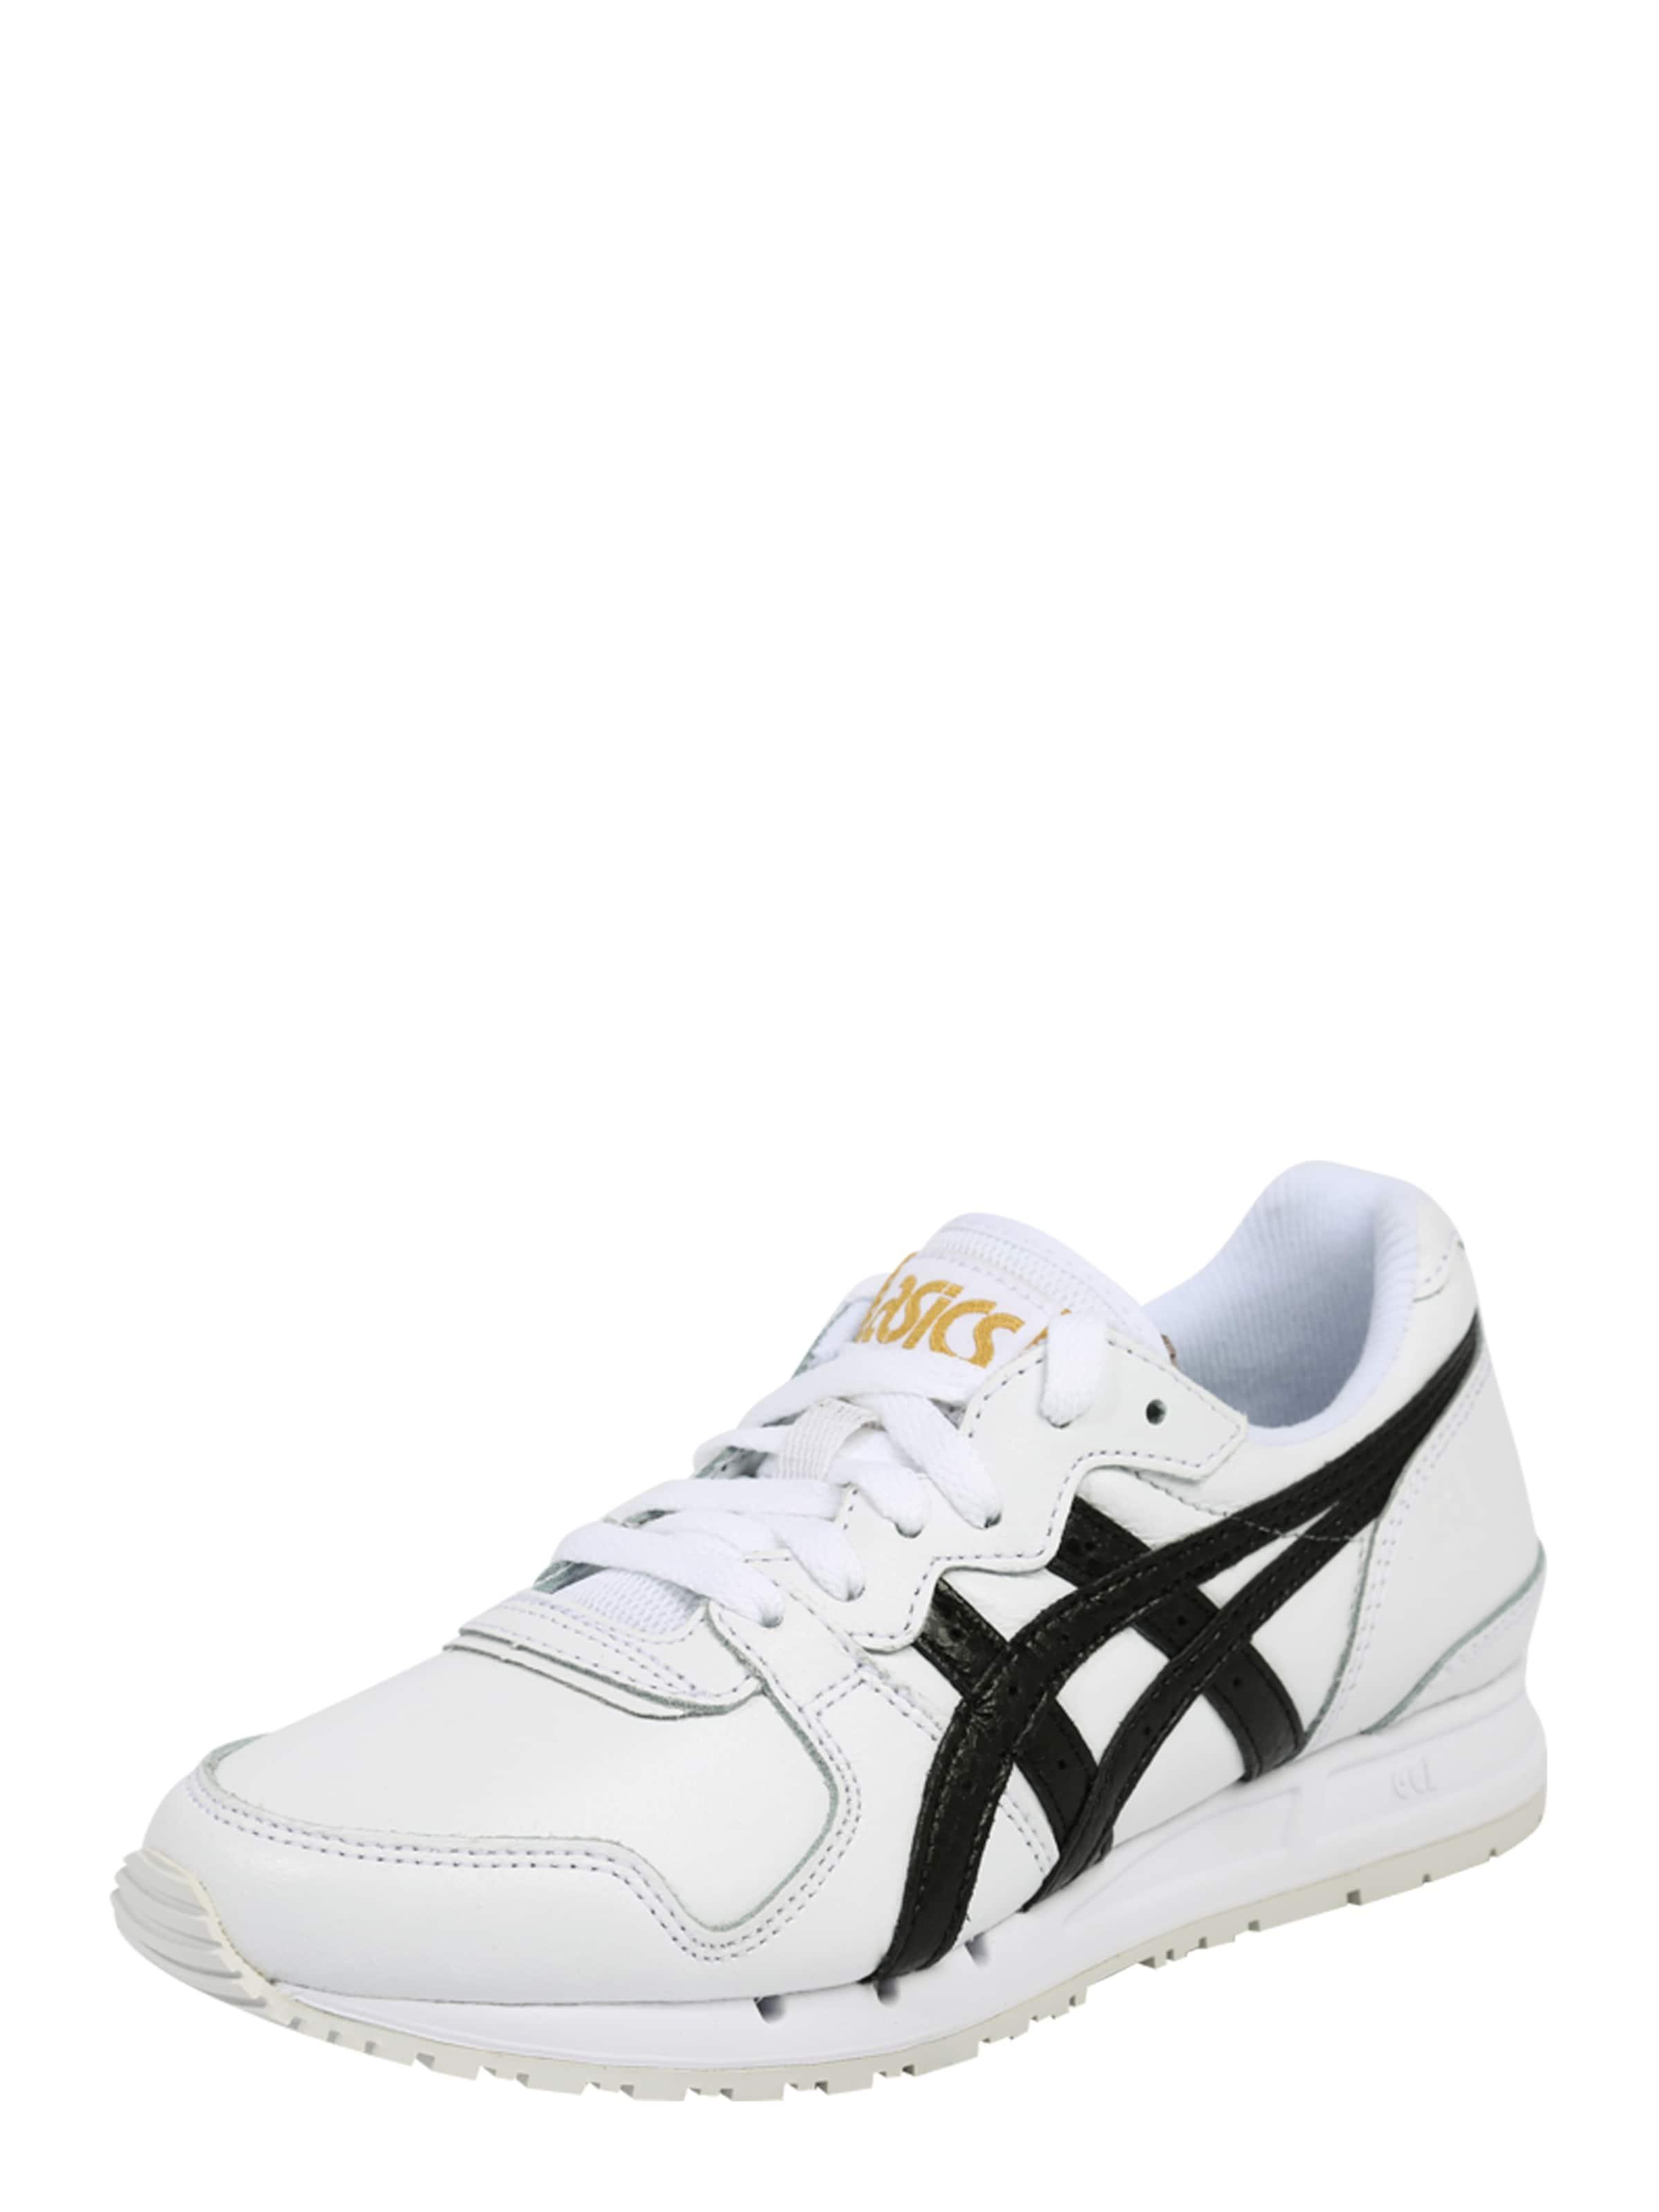 Asics Tiger Sneaker 'Movimentum' Verschleißfeste billige Schuhe